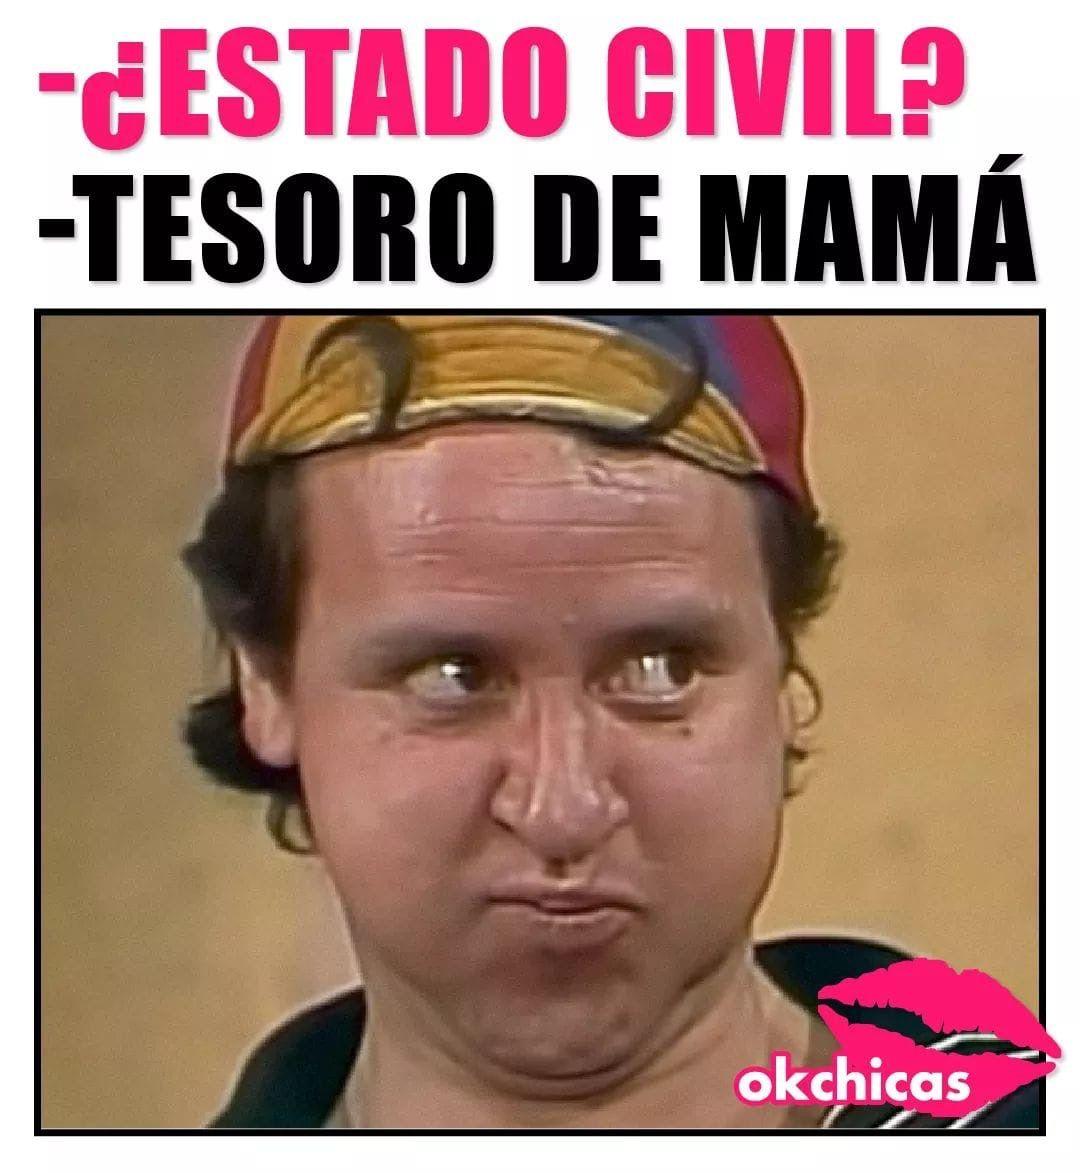 Pin De Yara Villar Gutierrez En Memes Memes De Quico Chistes Para Reir Imagenes Chistosas Para Whatsapp